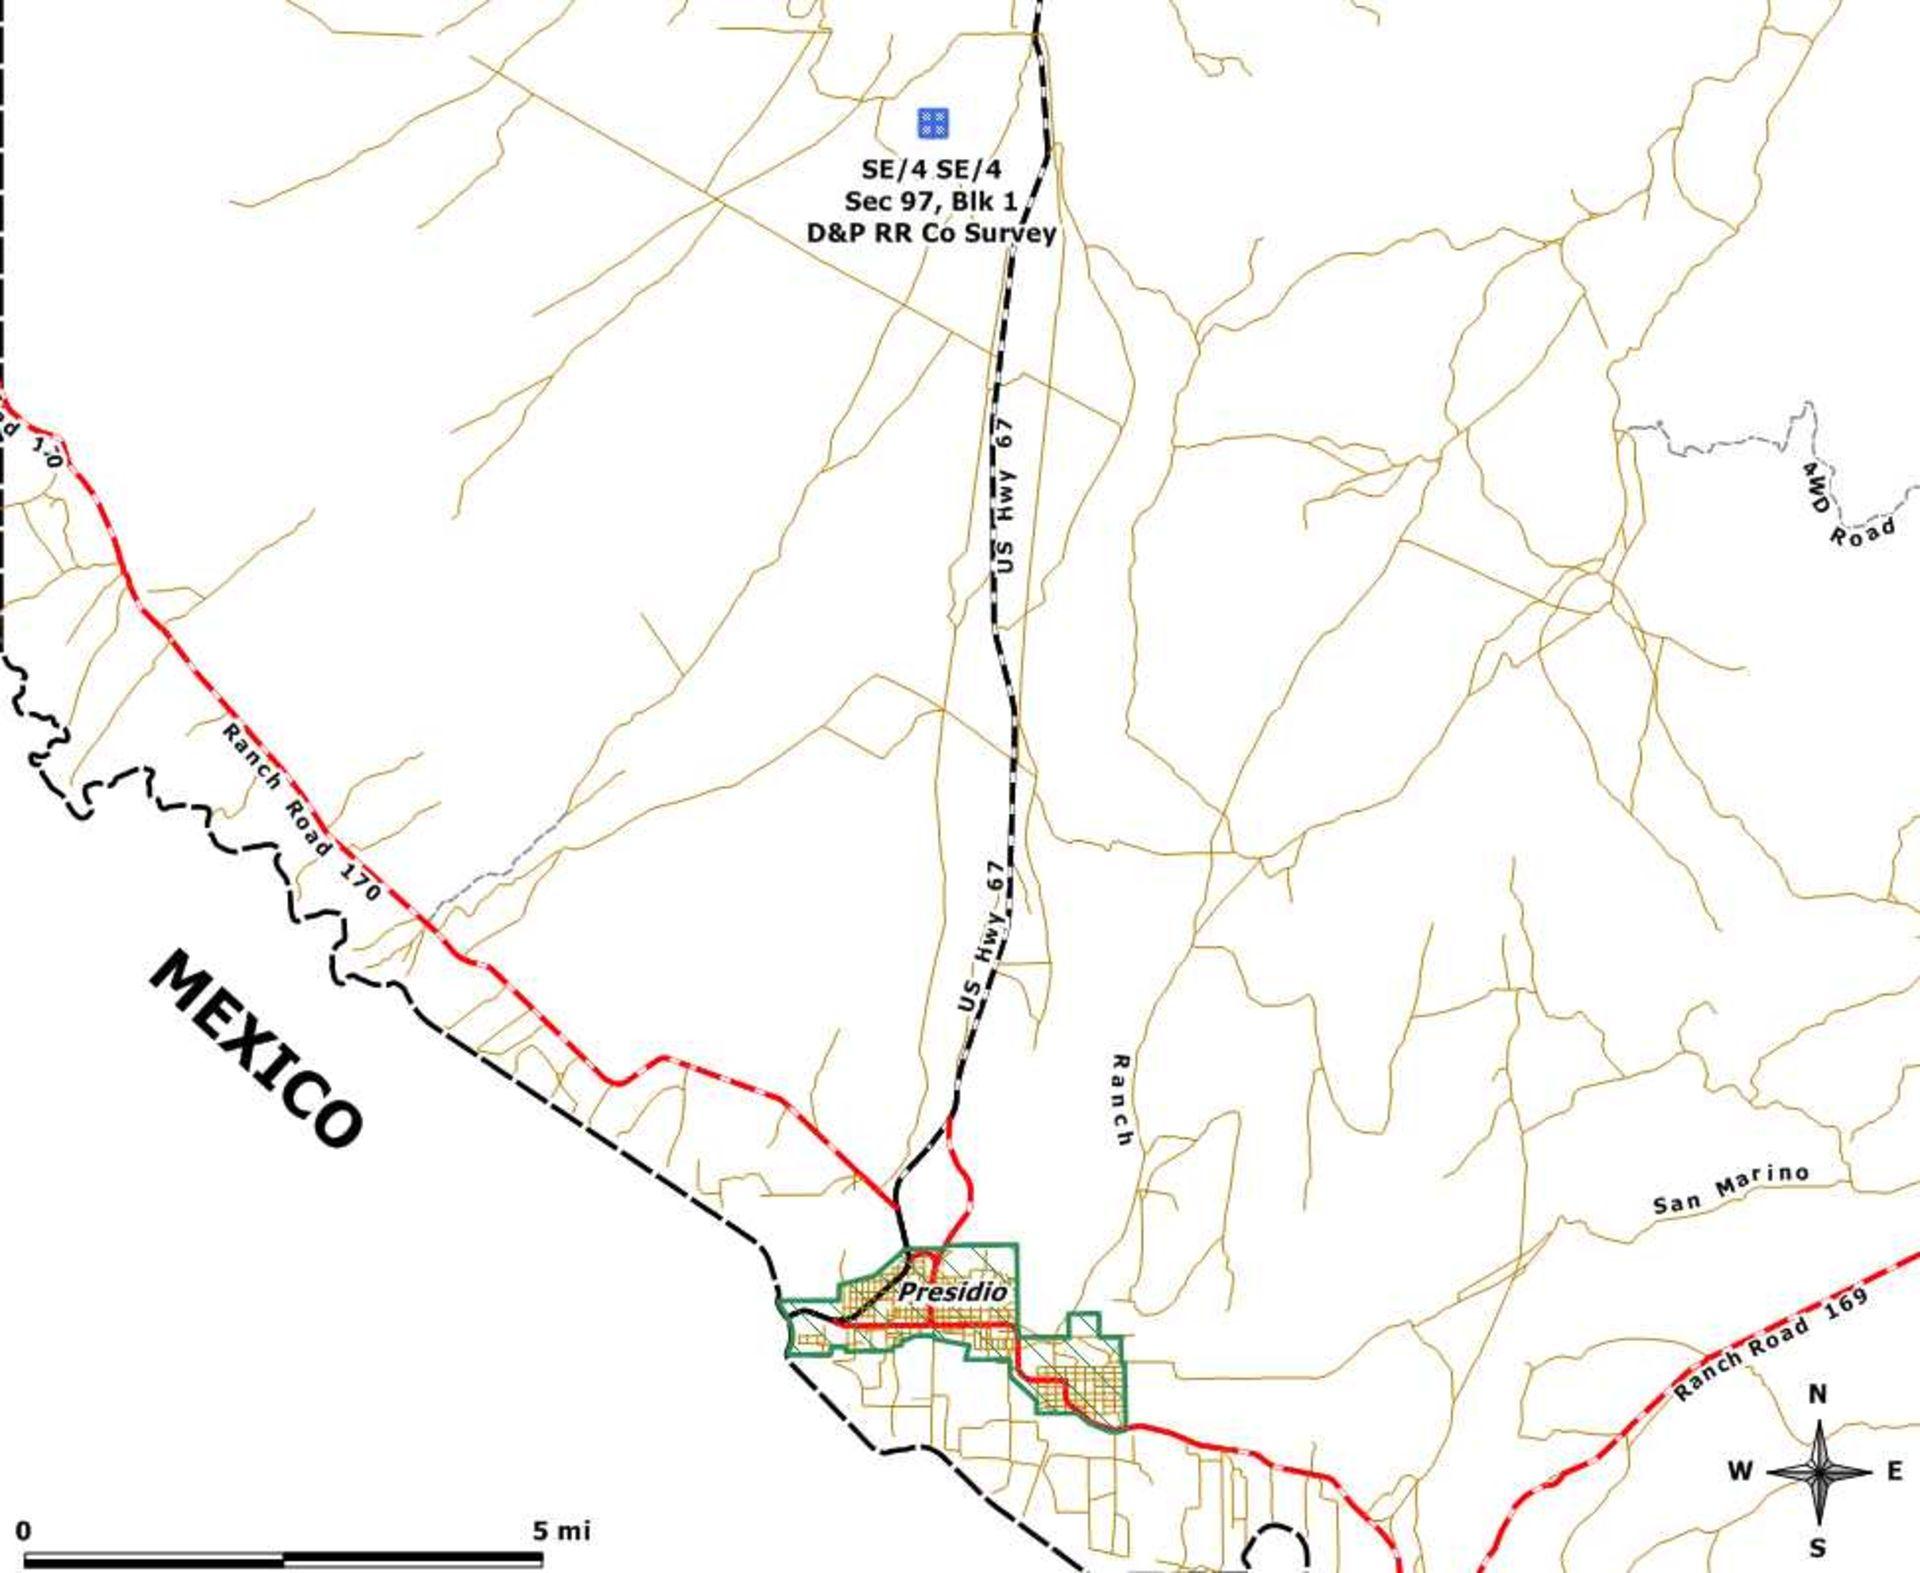 10 Acres in Presidio County, Texas! - Image 3 of 4